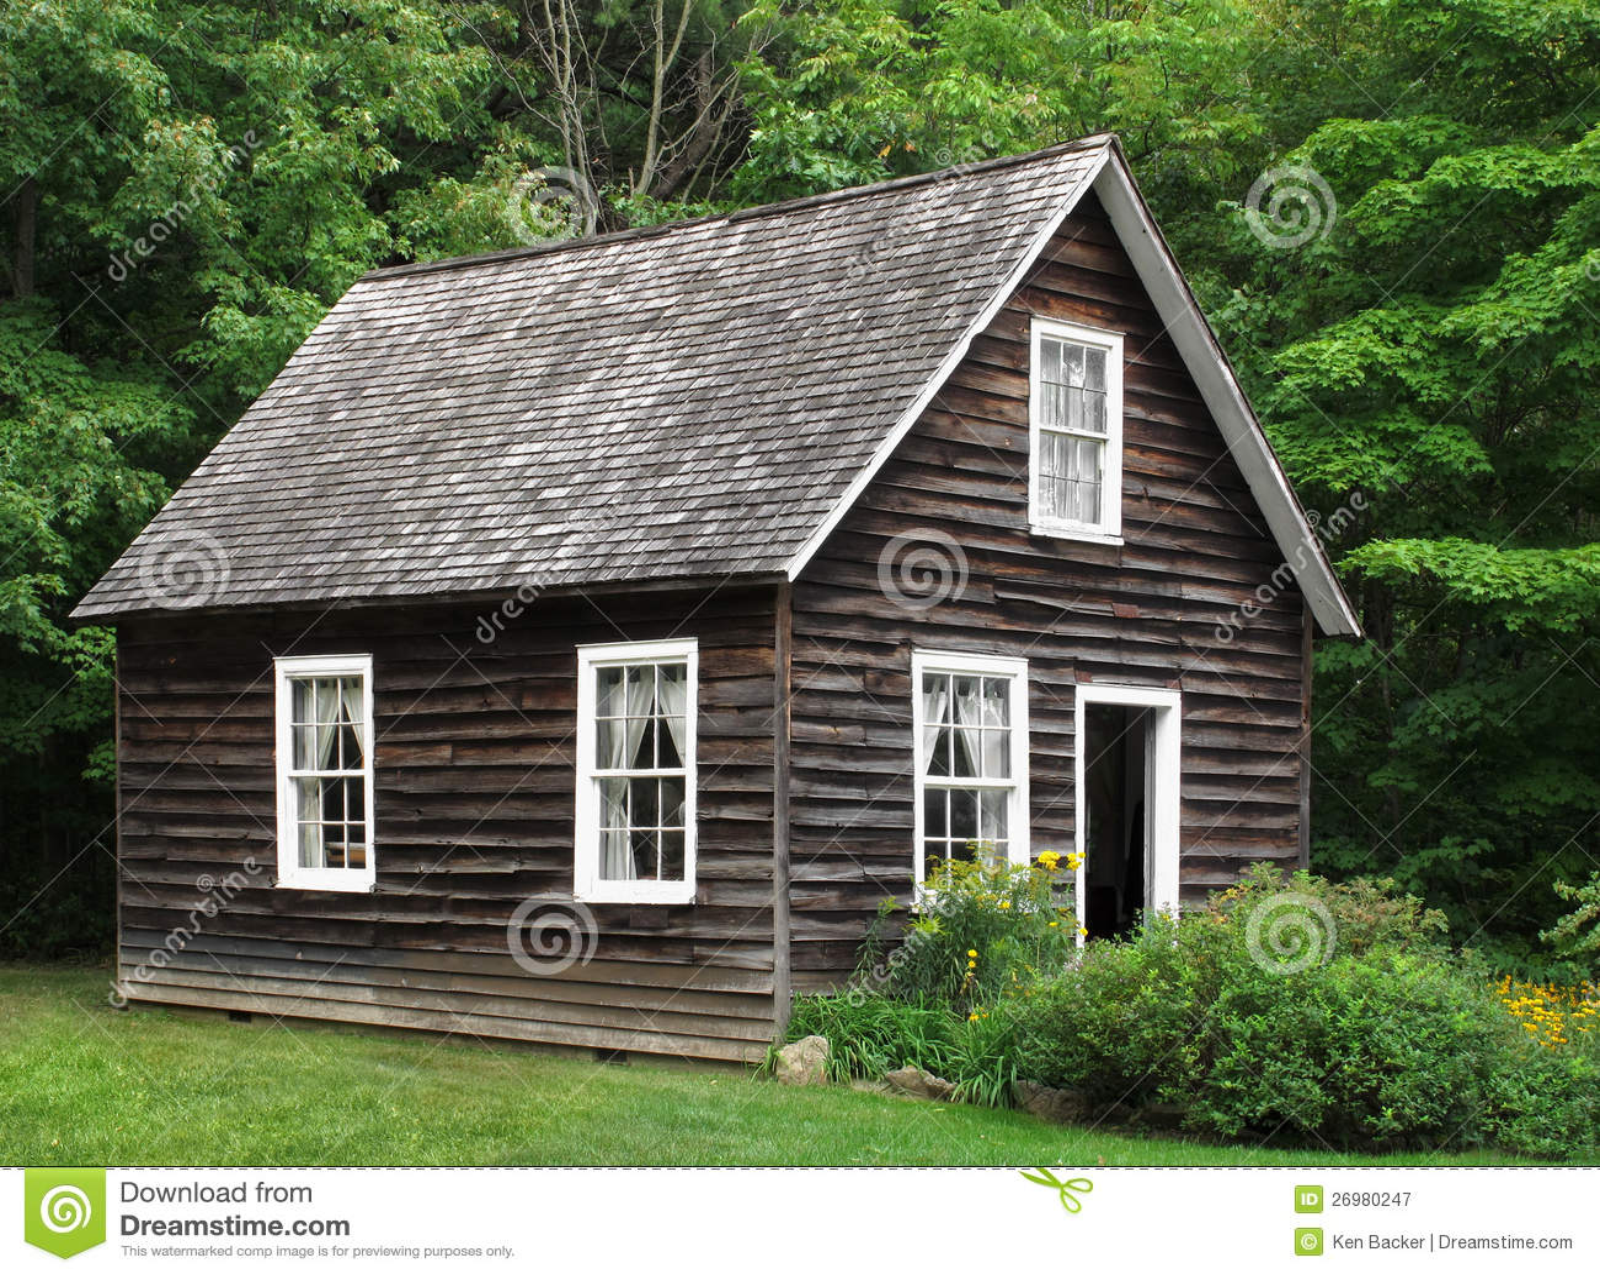 Peque a casa de madera r stica en rboles - Casa pequena de madera ...